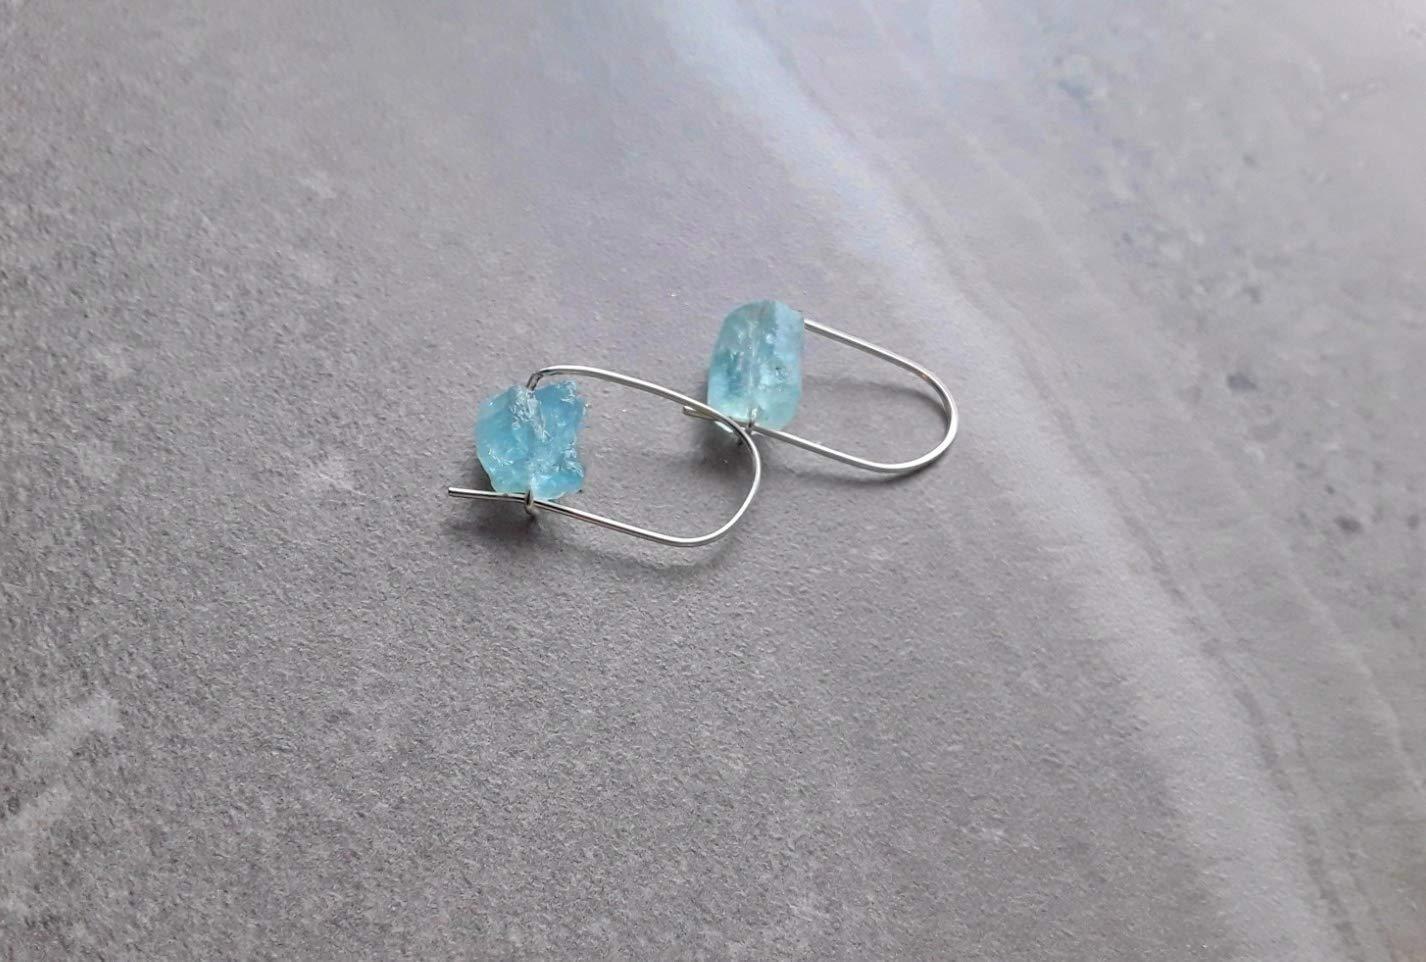 Raw Aquamarine Earrings Simple Earrings Sterling Silver Jewelry Handmade Gemstone Jewelry Minimal Earrings Aquamarine Gemstone Jewelry